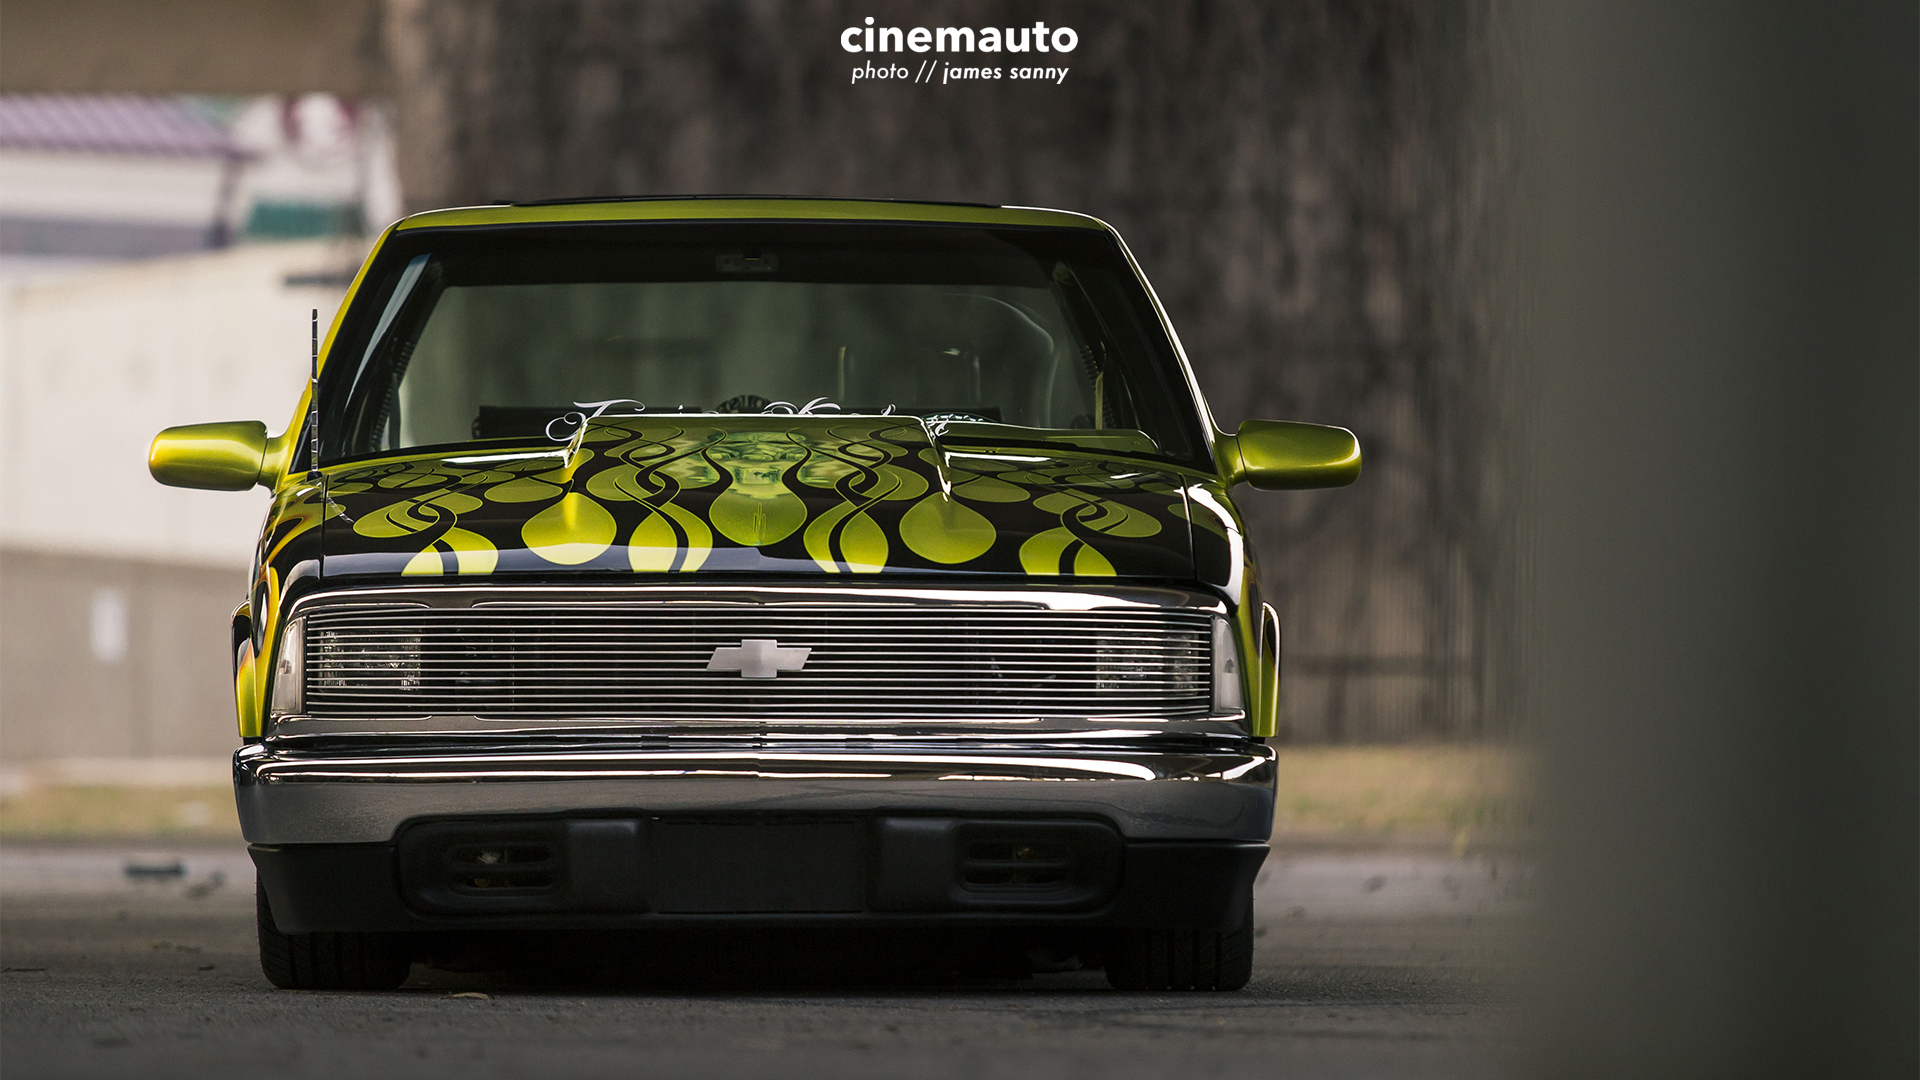 cinemauto-wichita-automotive-photographer-james-sanny-Ism.jpg